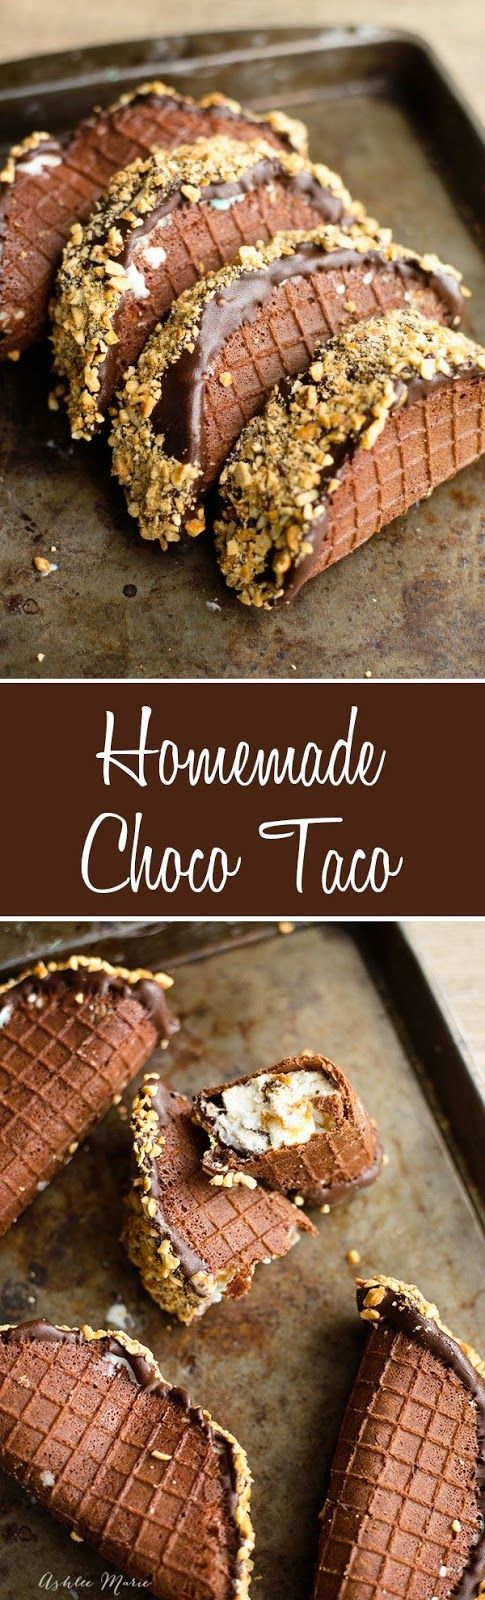 Homemade Choco Taco